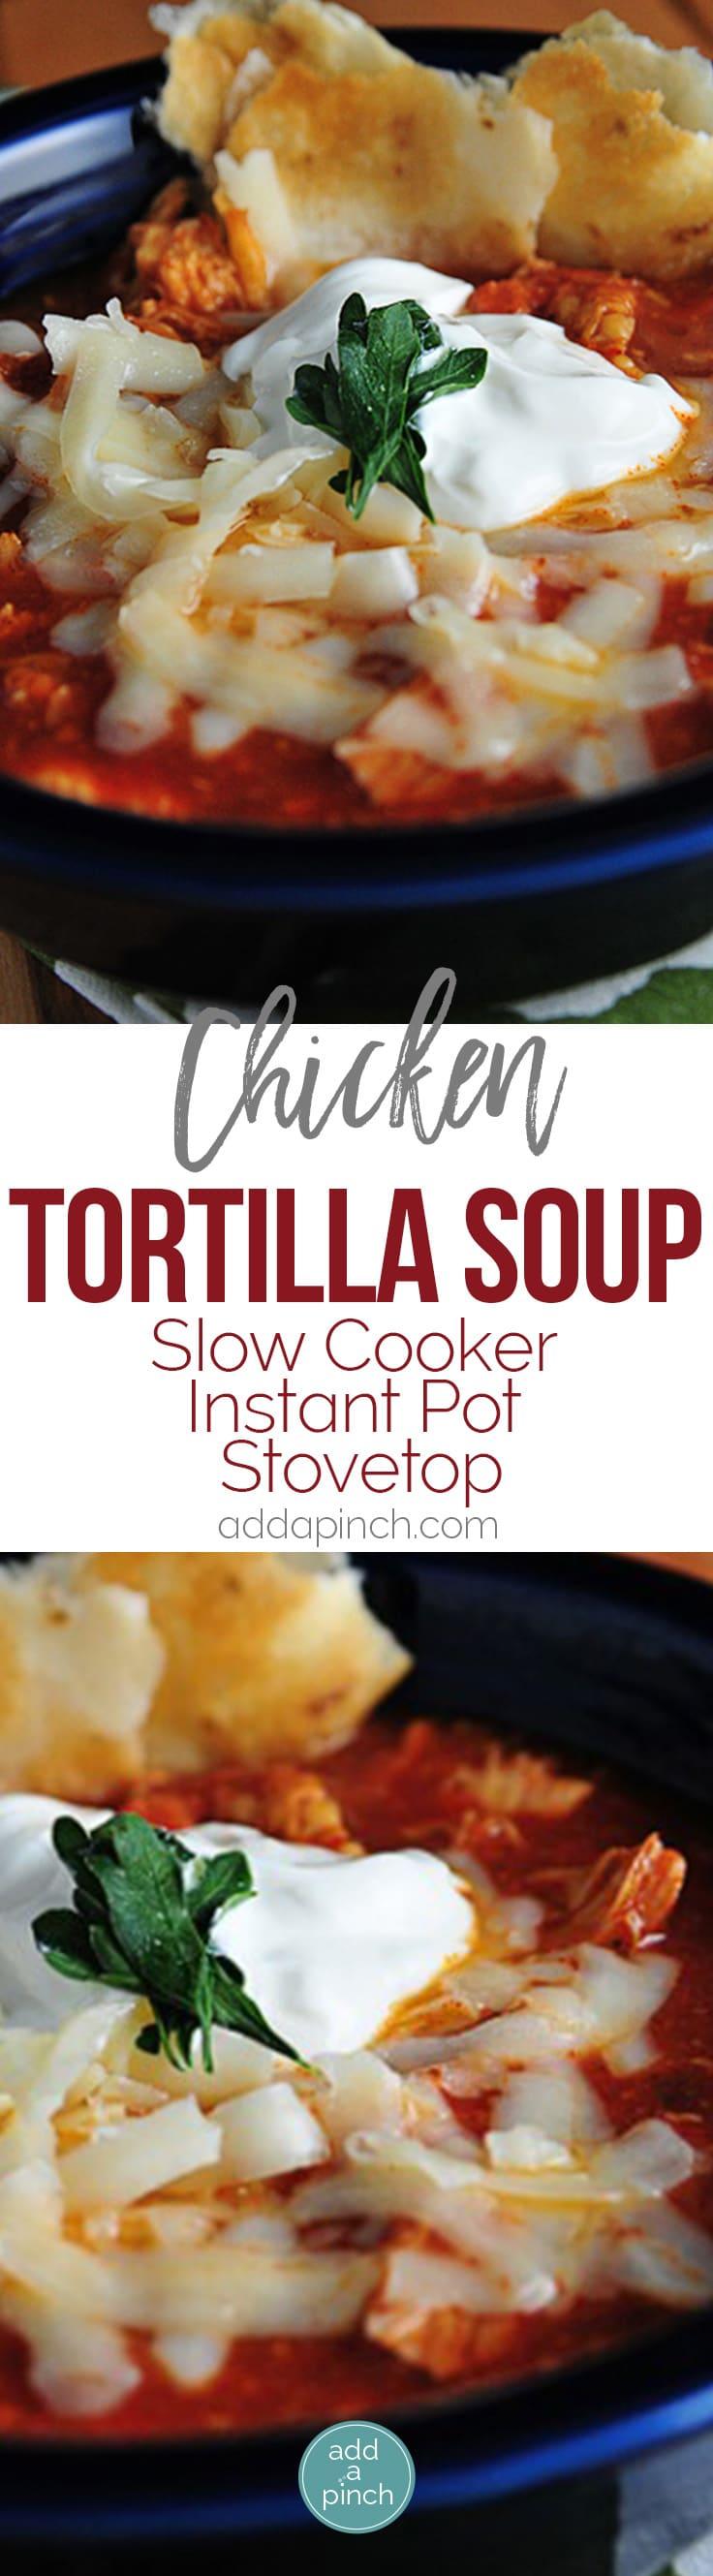 Chicken Tortilla Soup Recipe - Add a Pinch | Robyn Stone #chickentortillasoup